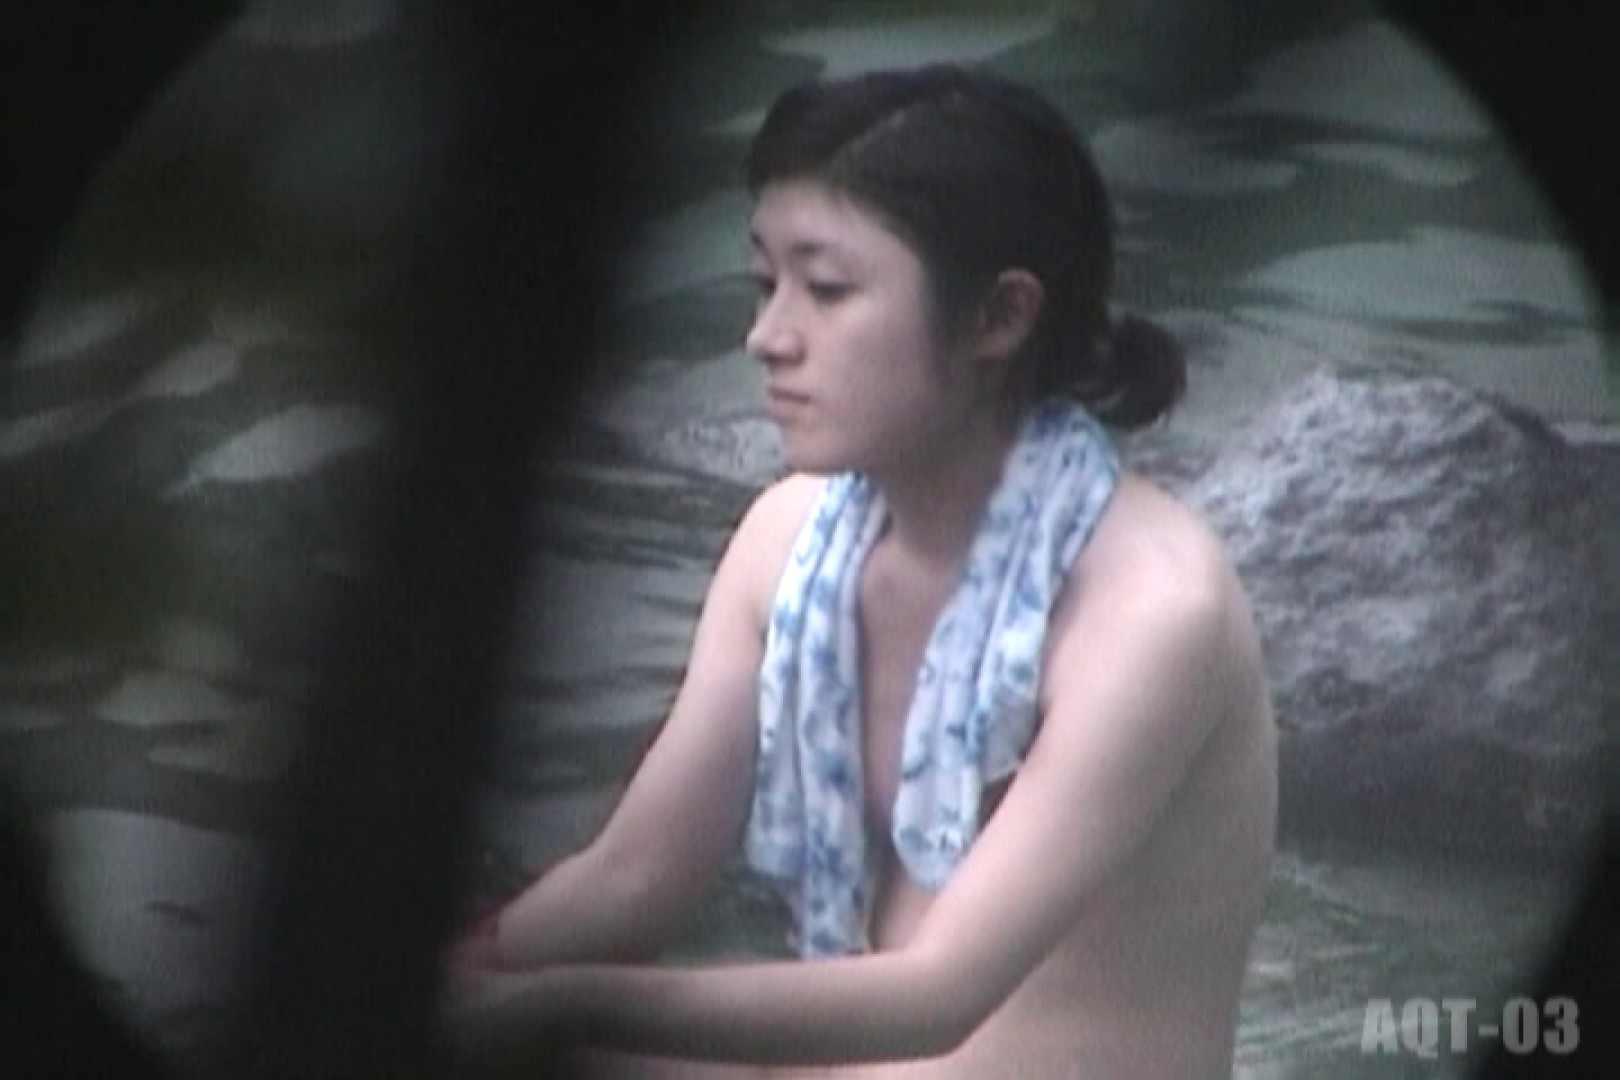 Aquaな露天風呂Vol.736 盗撮 エロ無料画像 60画像 56